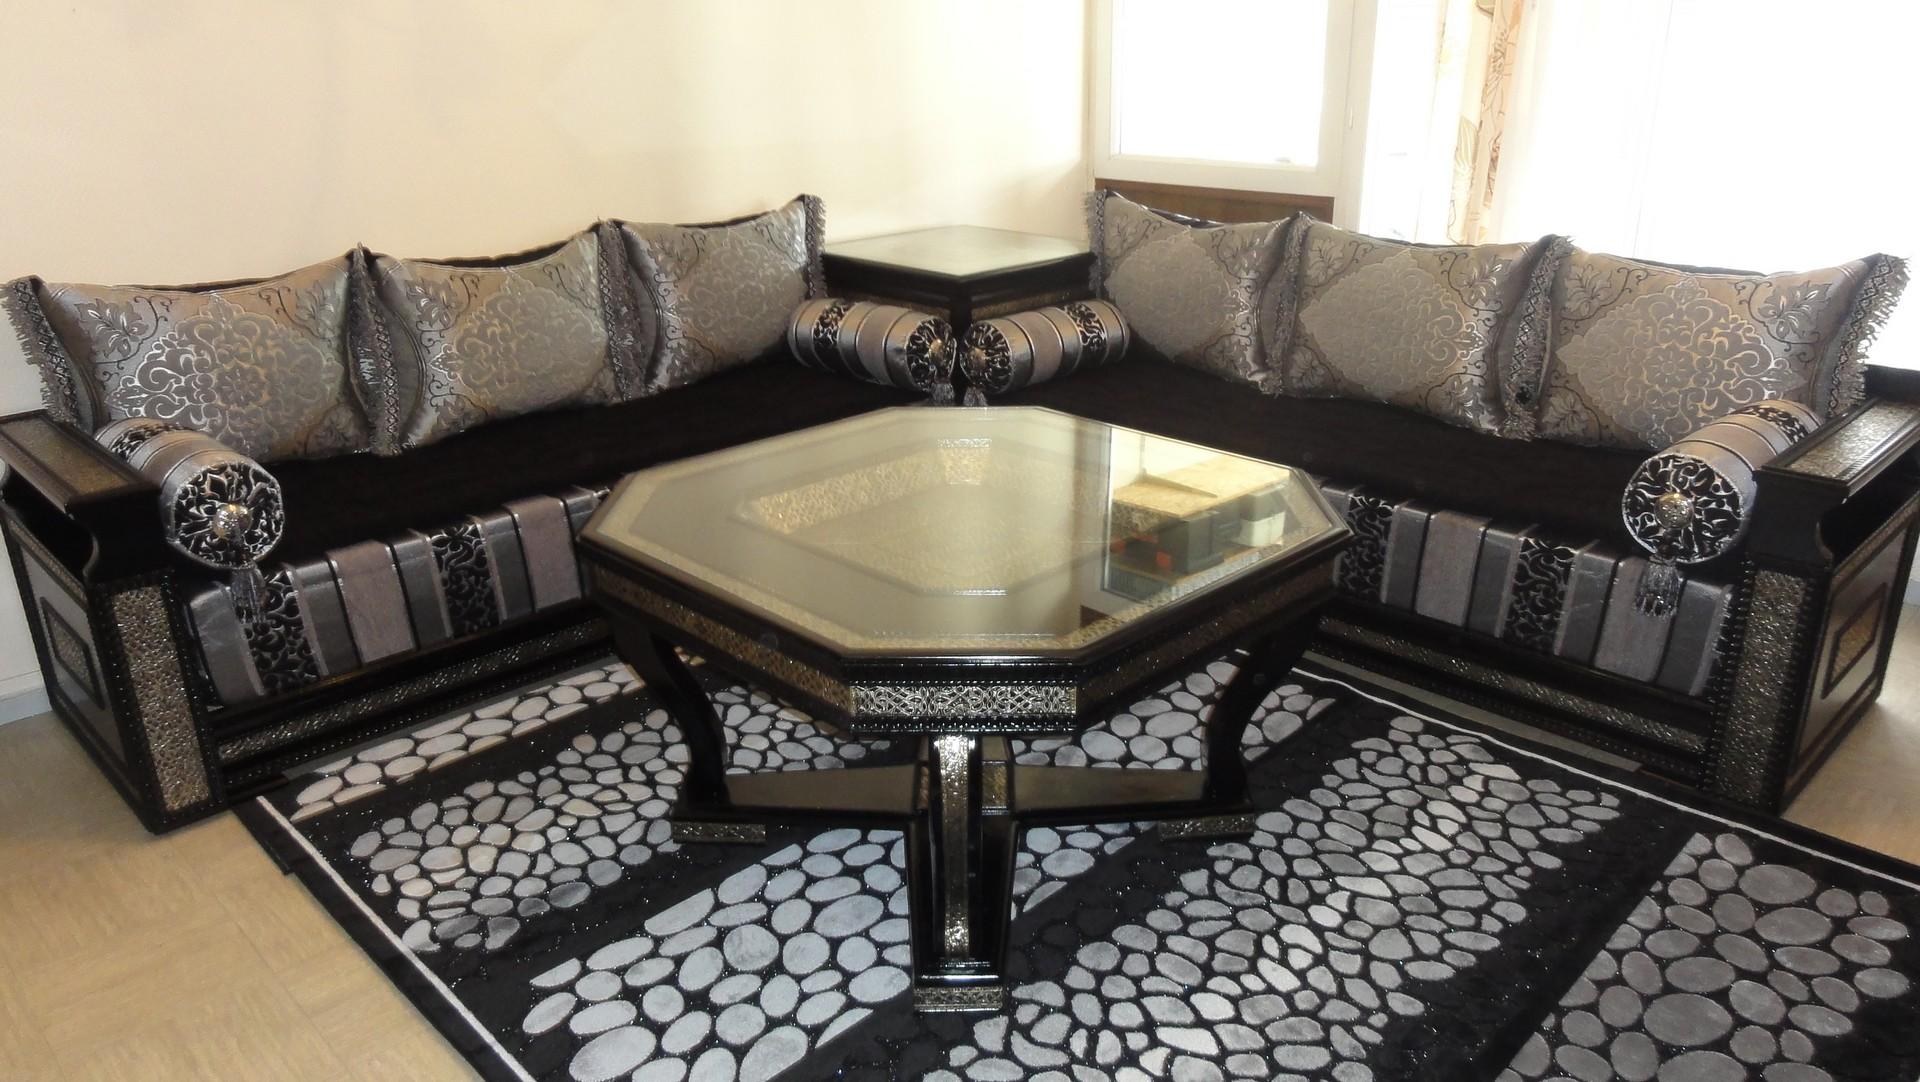 Salon Marocain Blanc et noir  Deco salon marocain